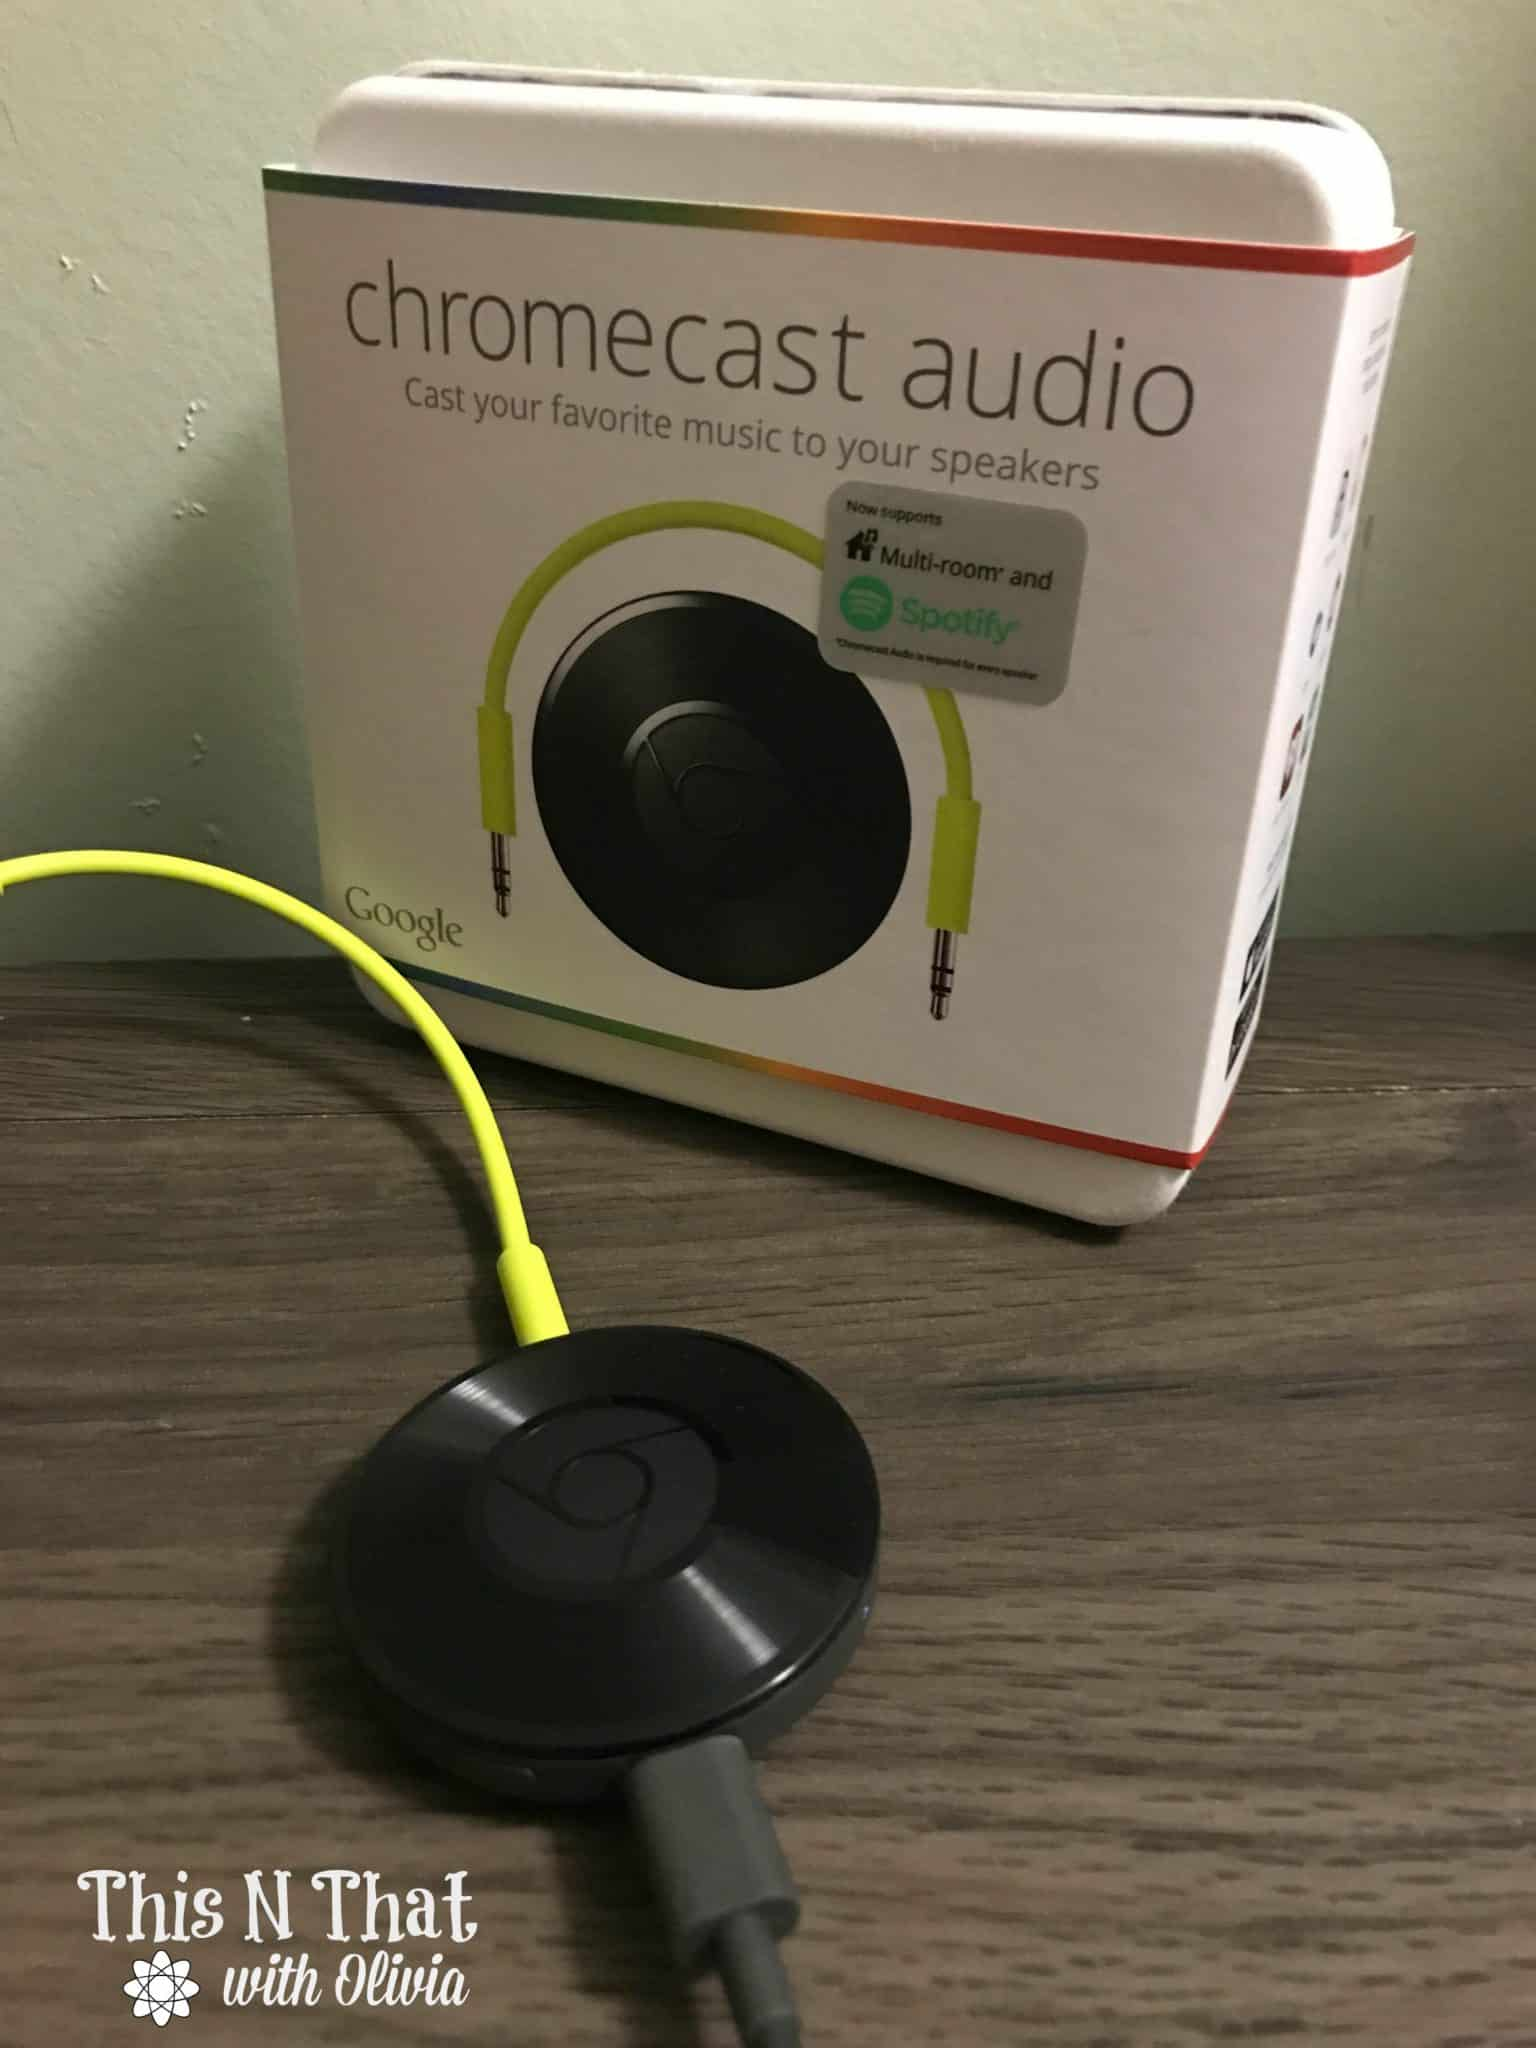 Google Chromecast Audio Available at Best Buy @BestBuy @Chromecast #Ad